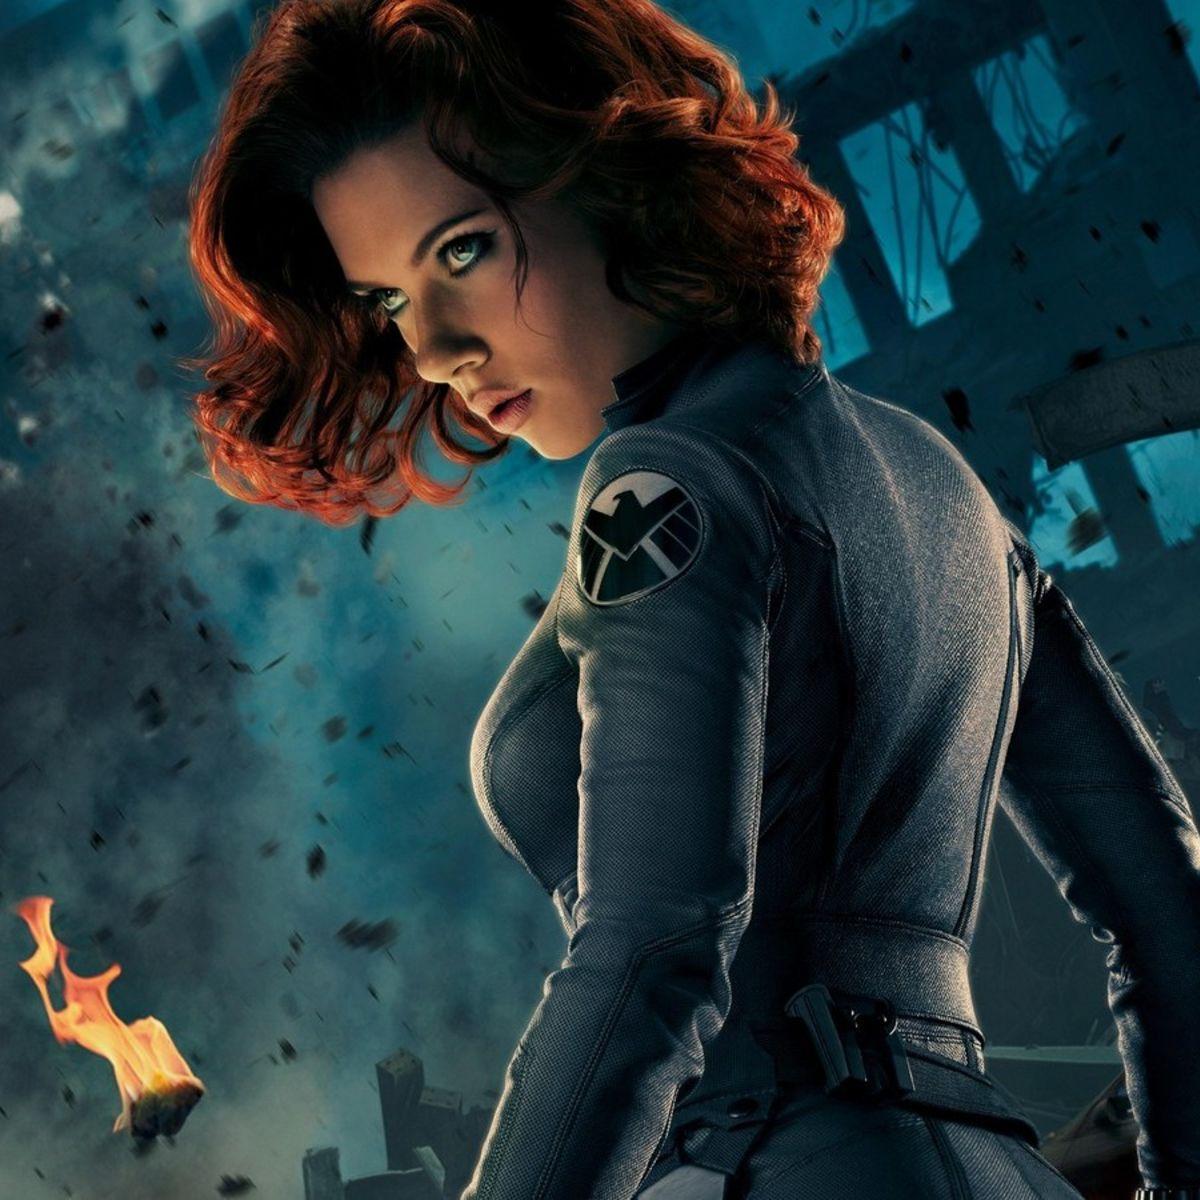 the-avengers-black-widow.jpg